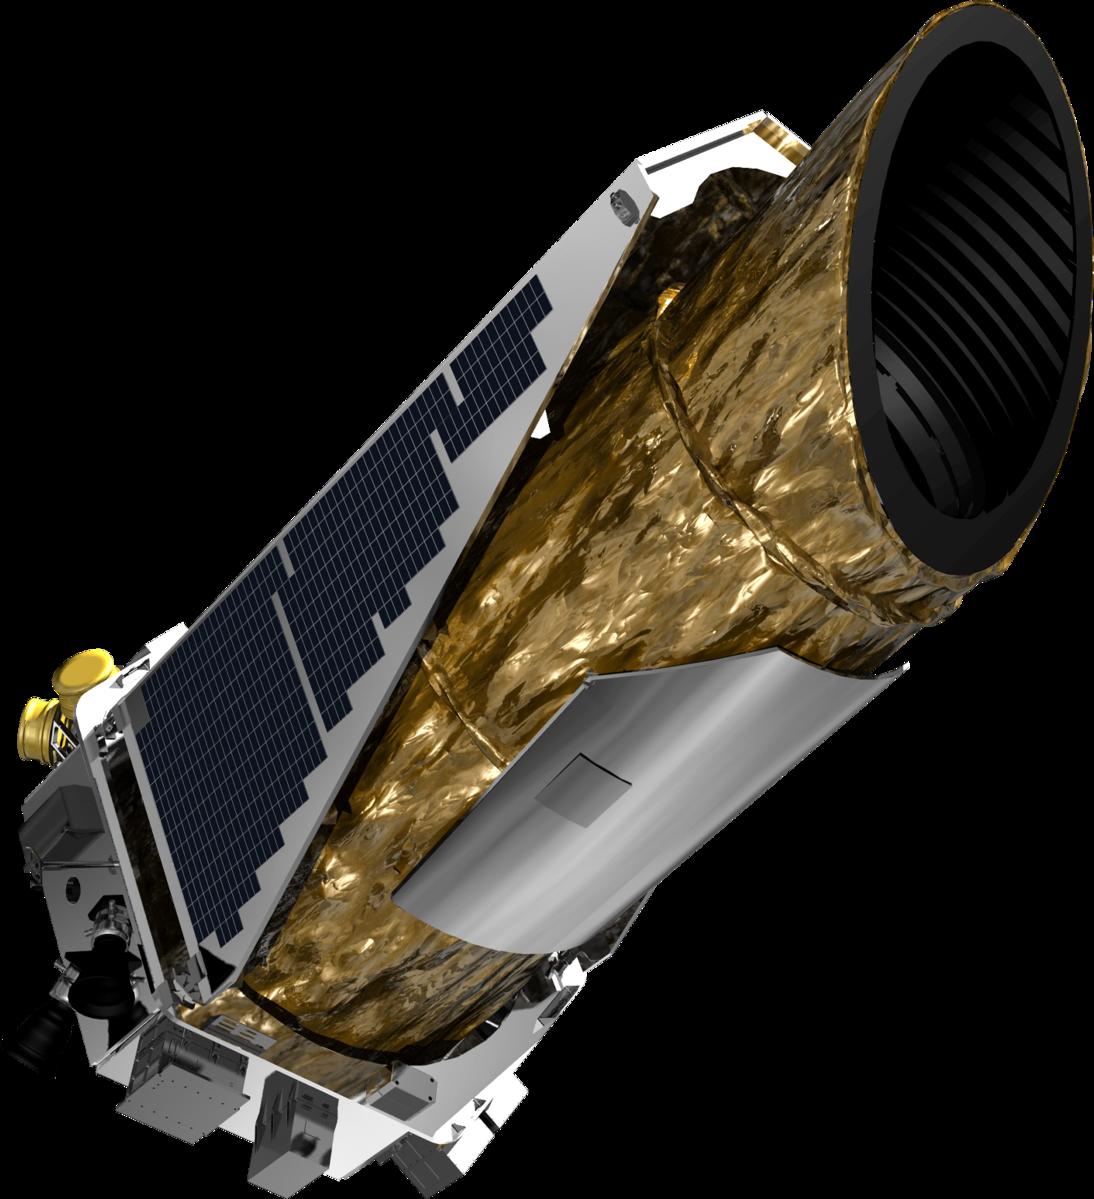 kepler spacecraft telescope - HD1094×1199